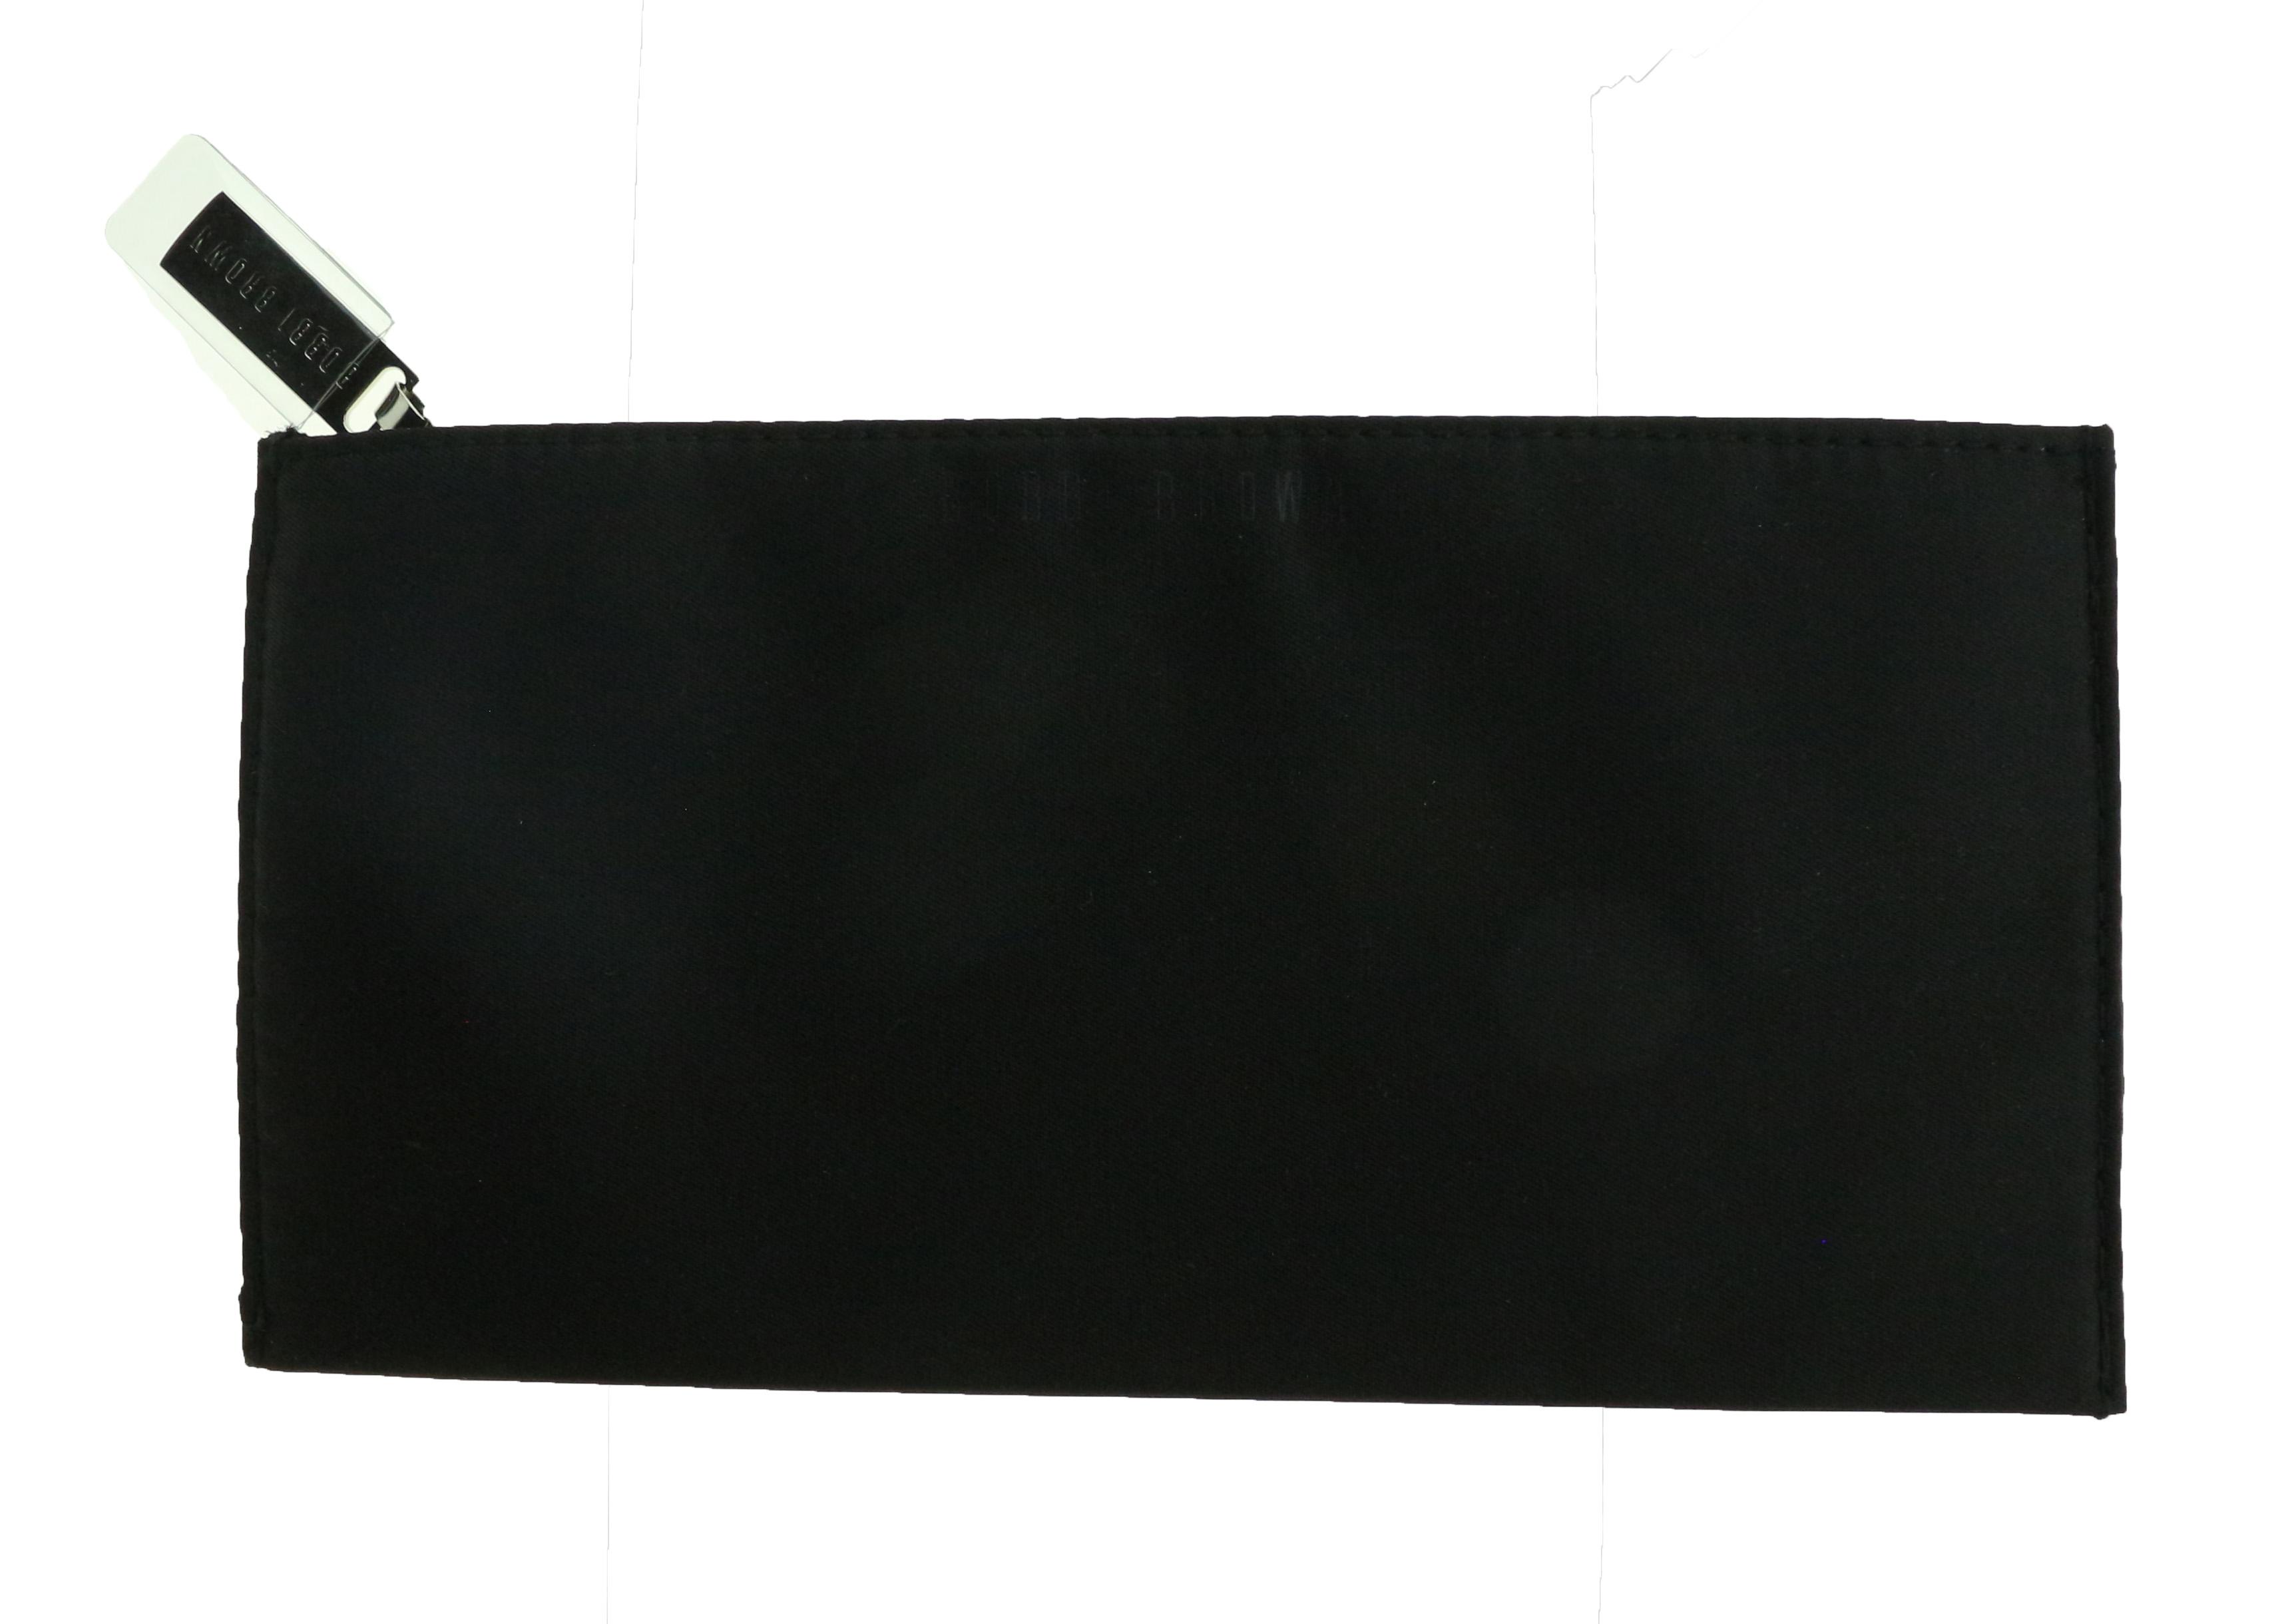 Details About Bobbi Brown Elegant Black Faille Makeup Bag Clutch New